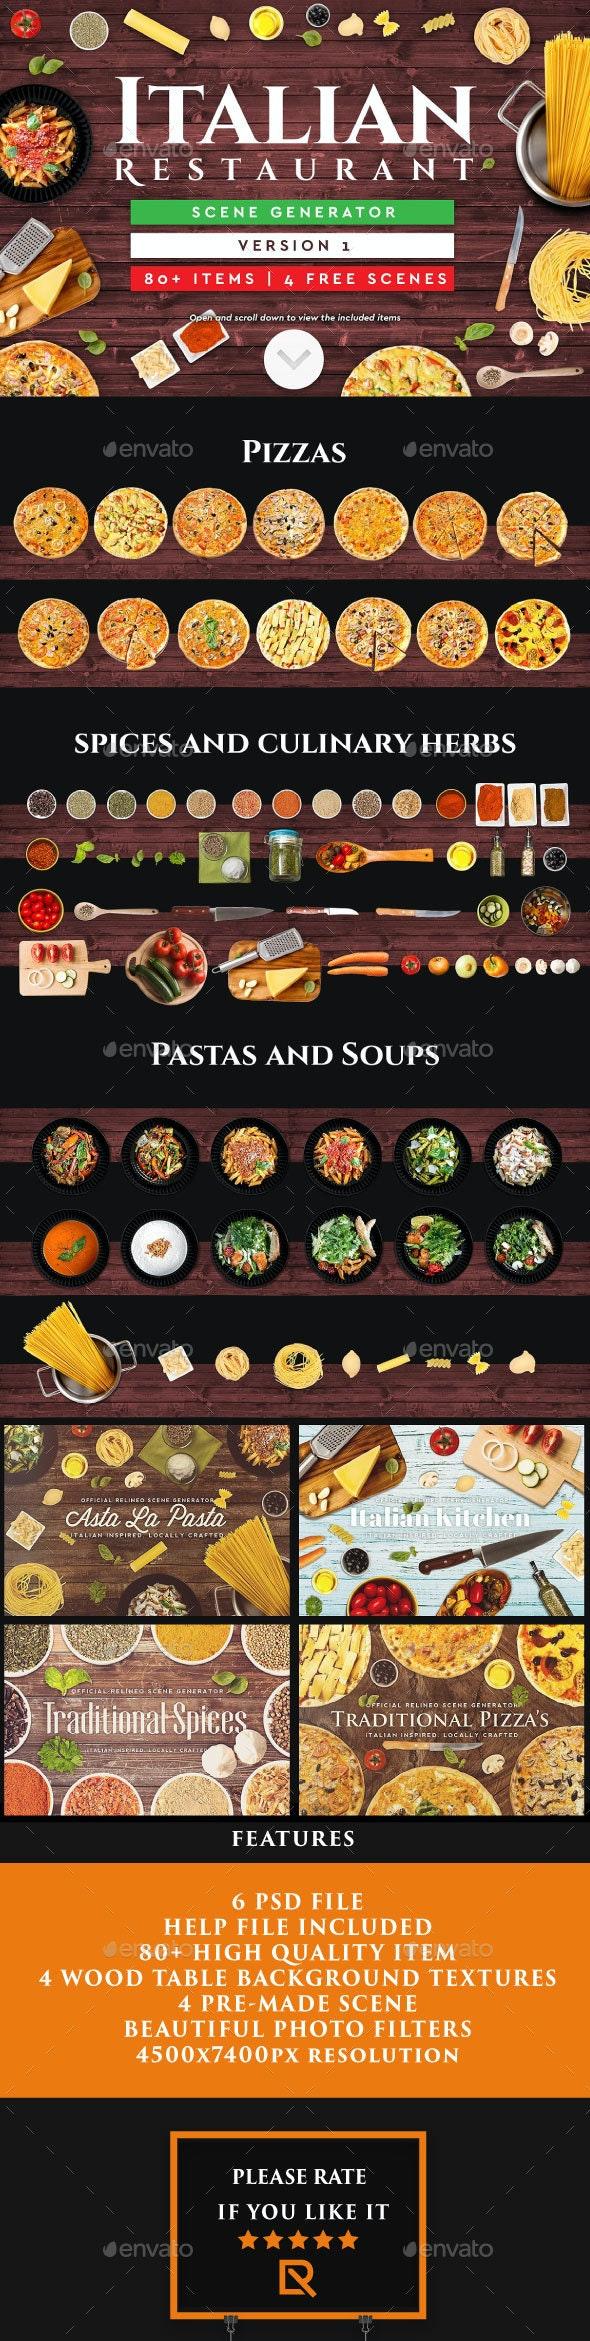 Italian Restaurant Scene Generator - Hero Images Graphics